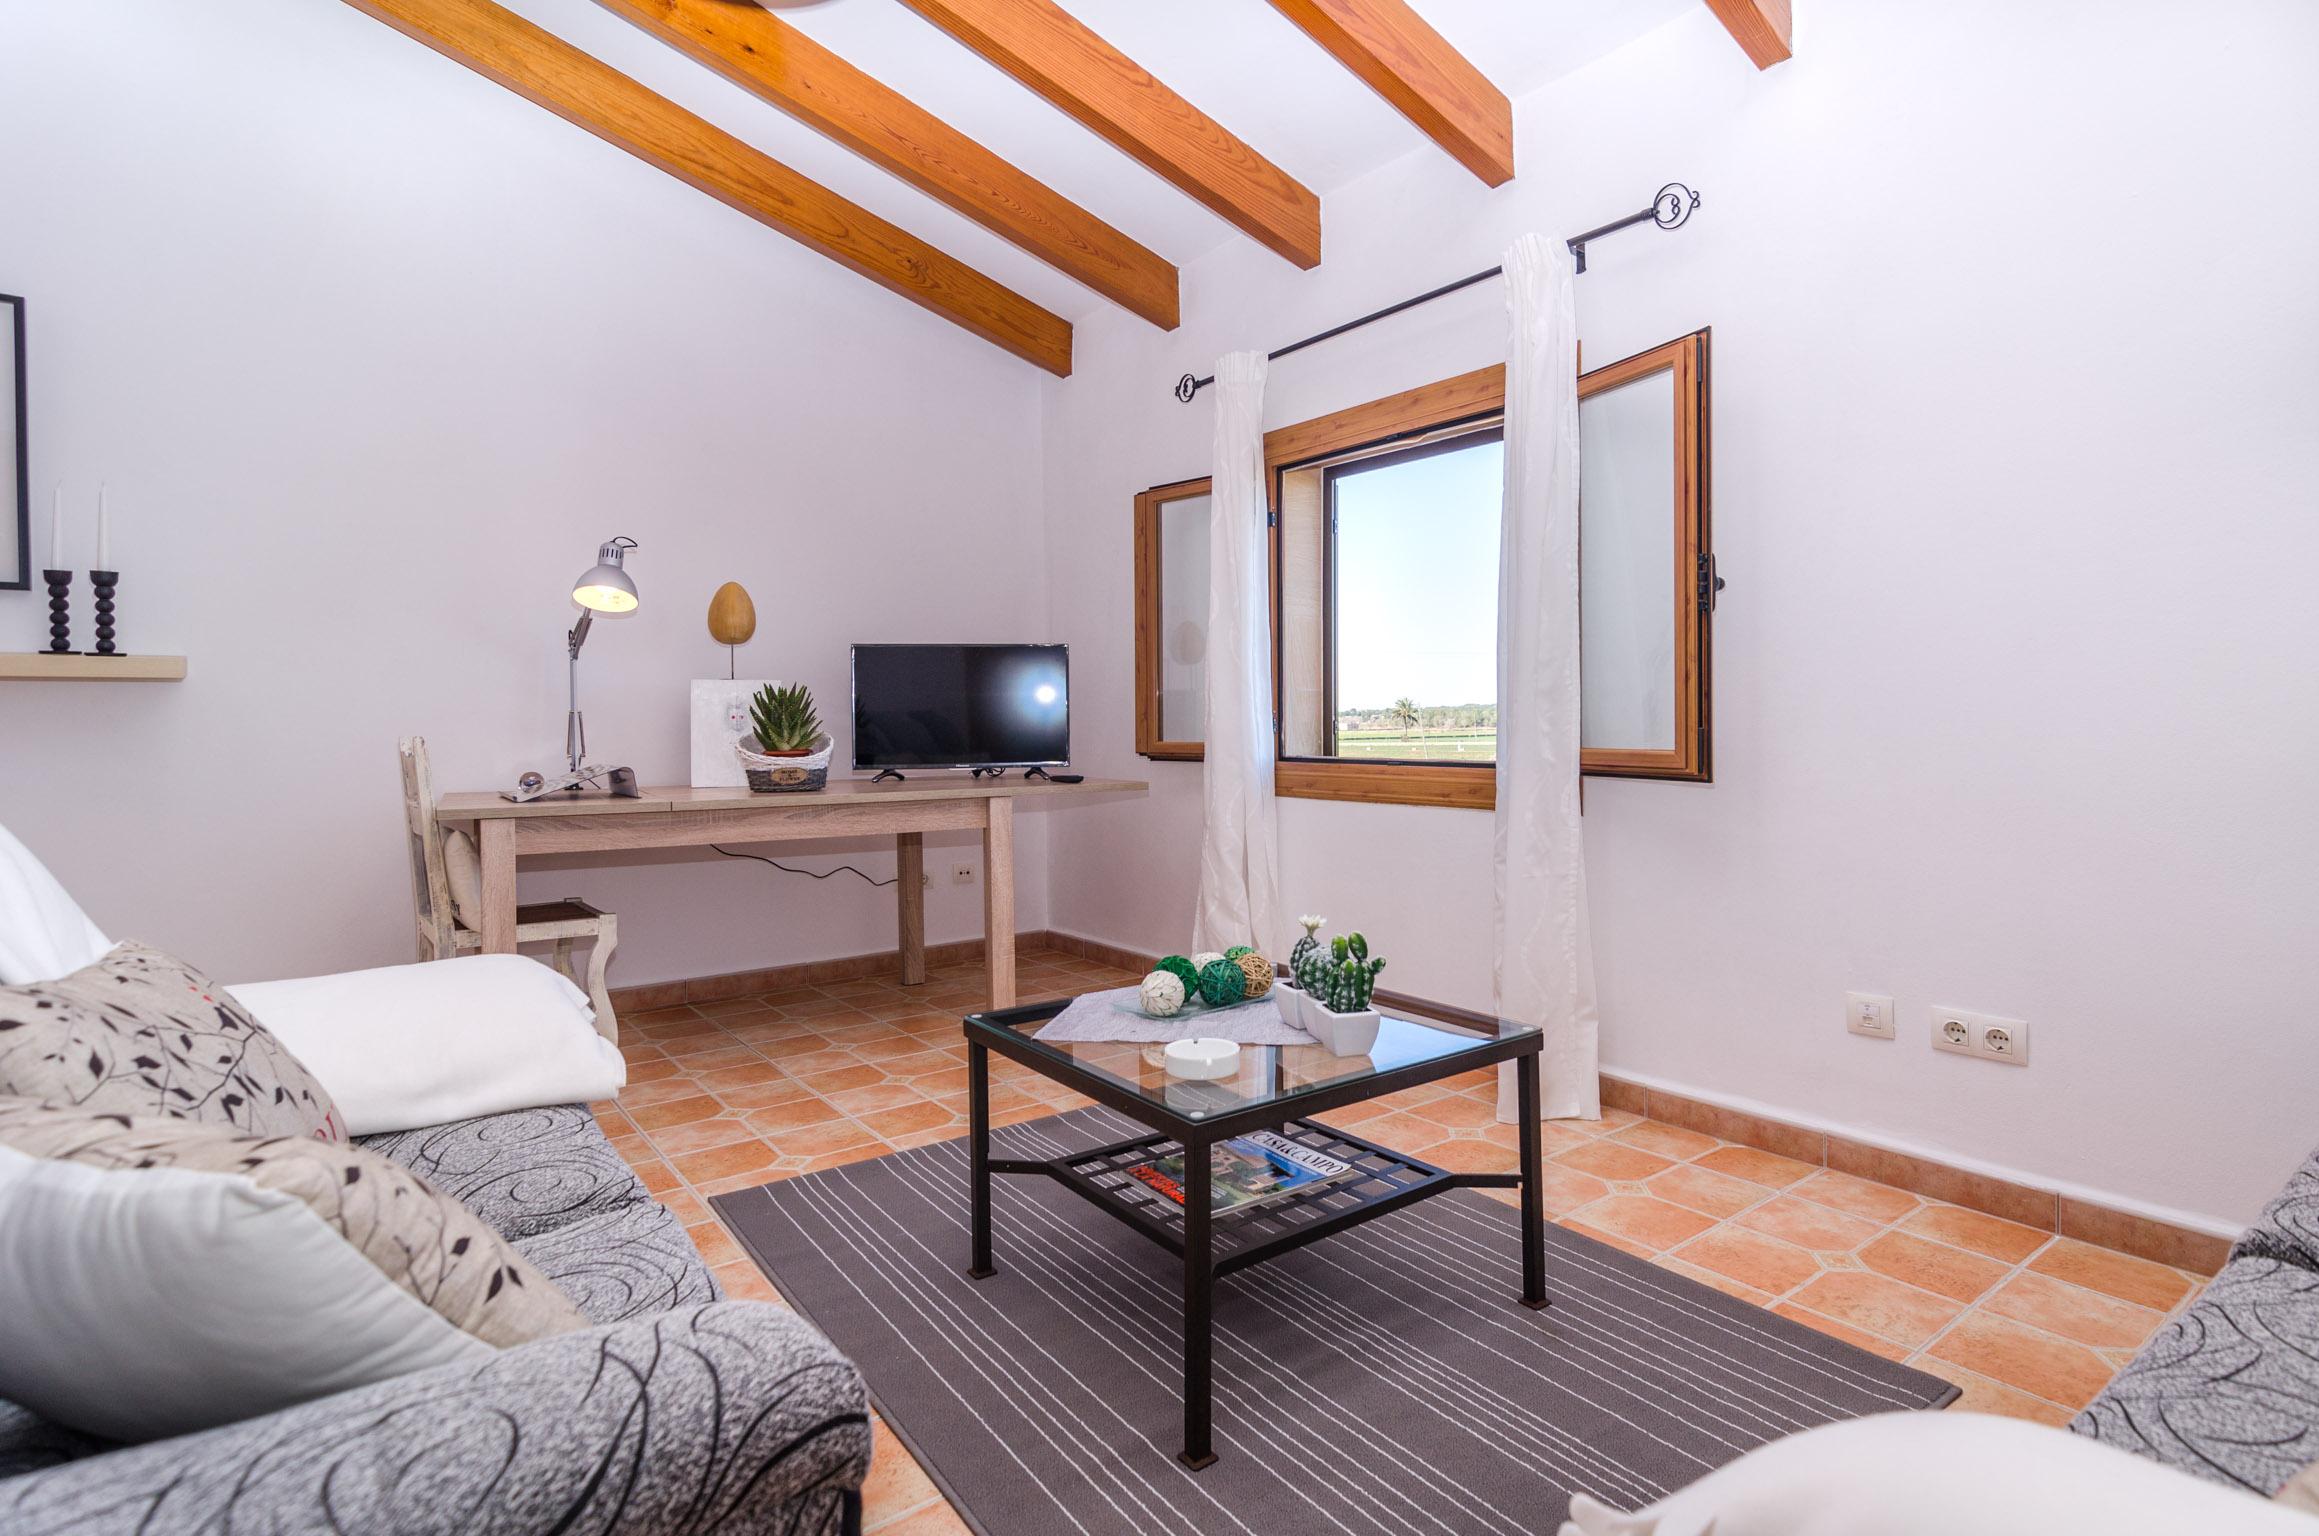 Ferienhaus SANT BLAI VELL (2284789), Campos, Mallorca, Balearische Inseln, Spanien, Bild 15